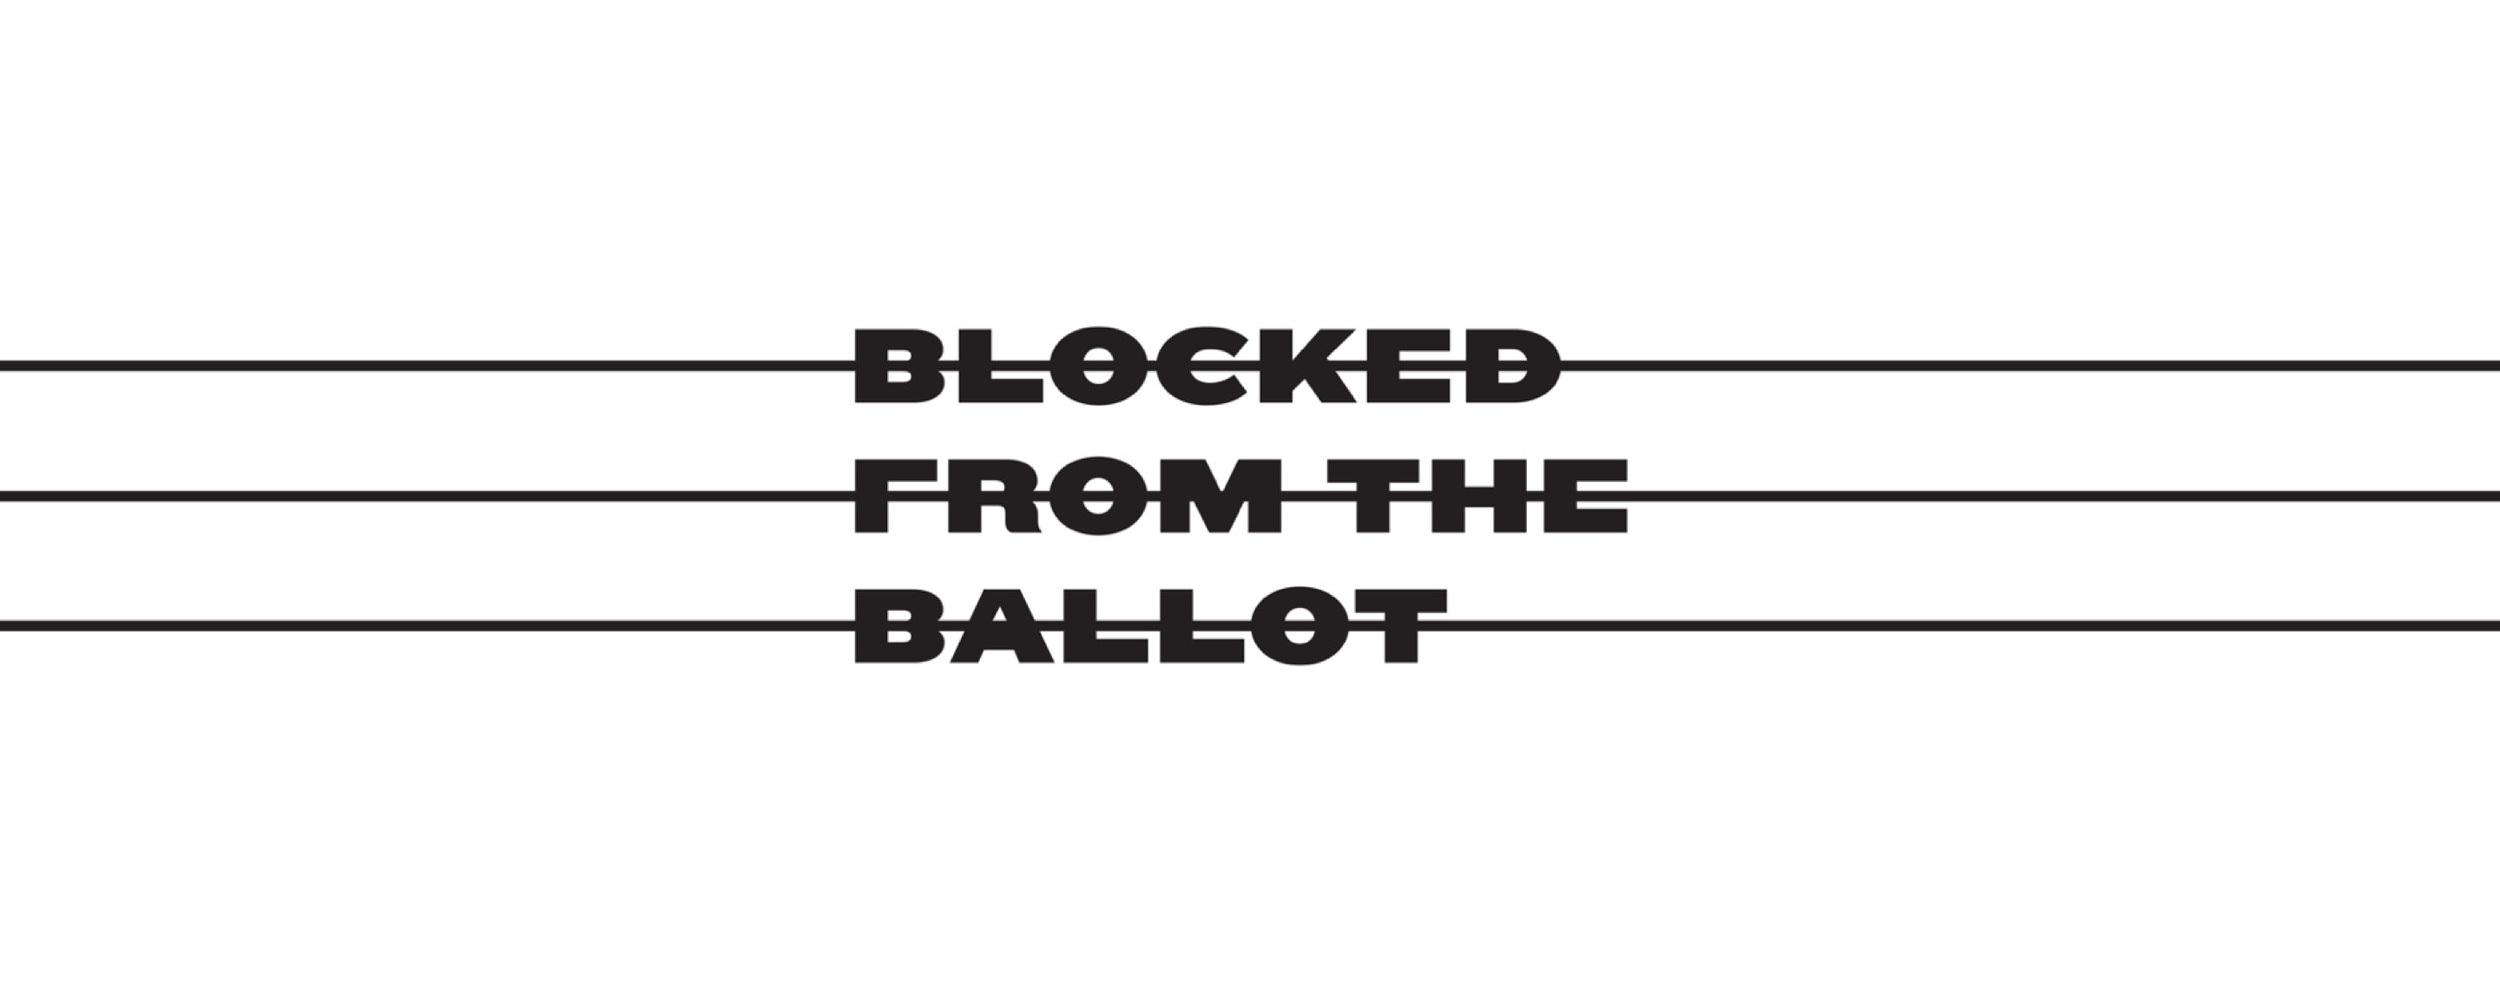 blocked-from-the-ballot-2.jpg